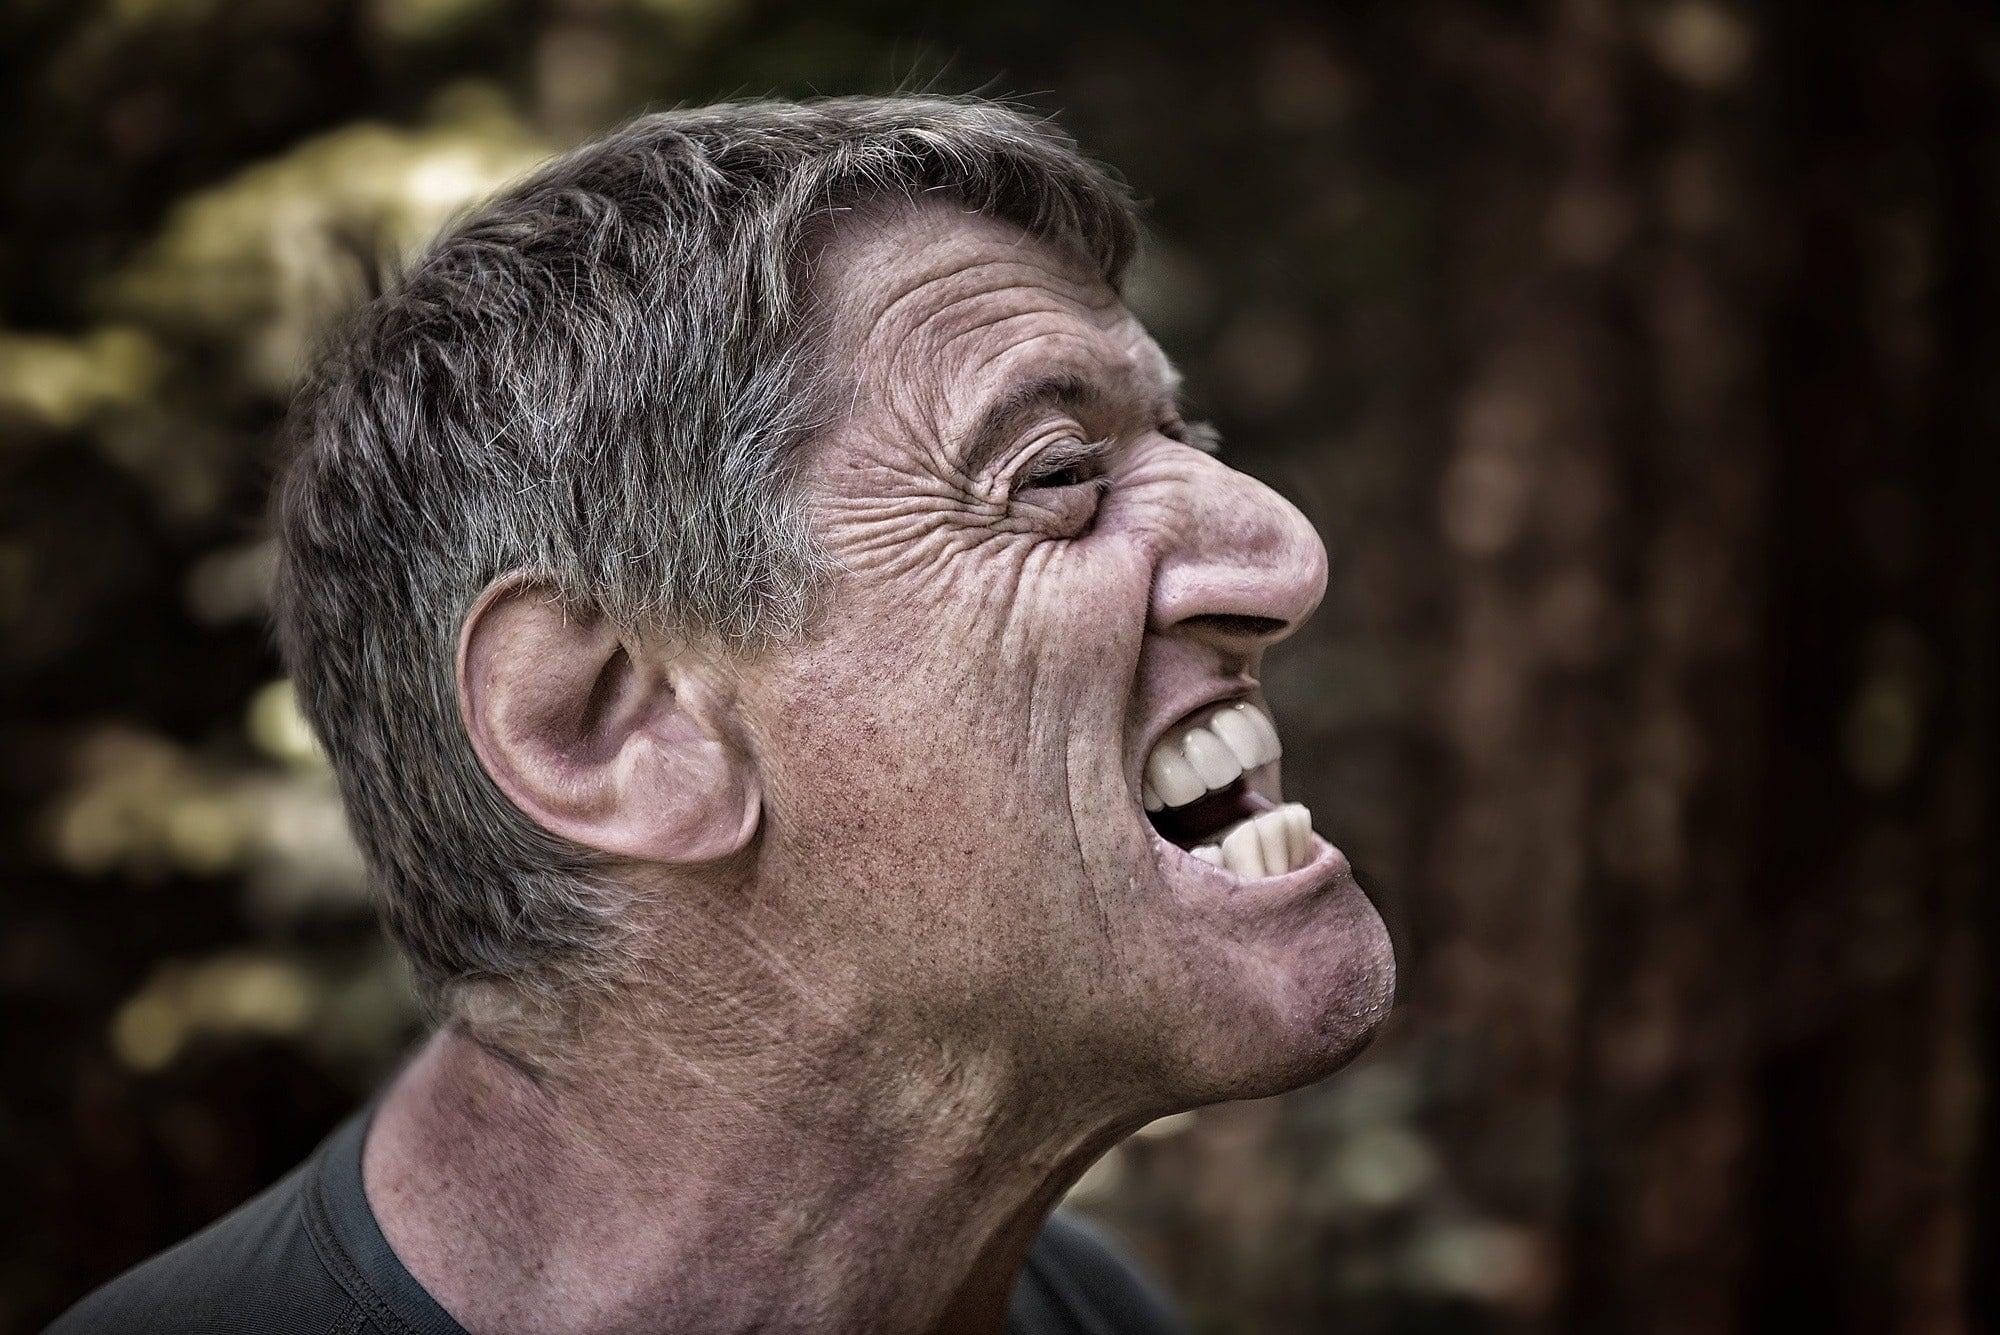 adult anger angry man face portrait pain 約瑟夫經驗談:被蜈蚣螫咬的毒傷讓人生不如死